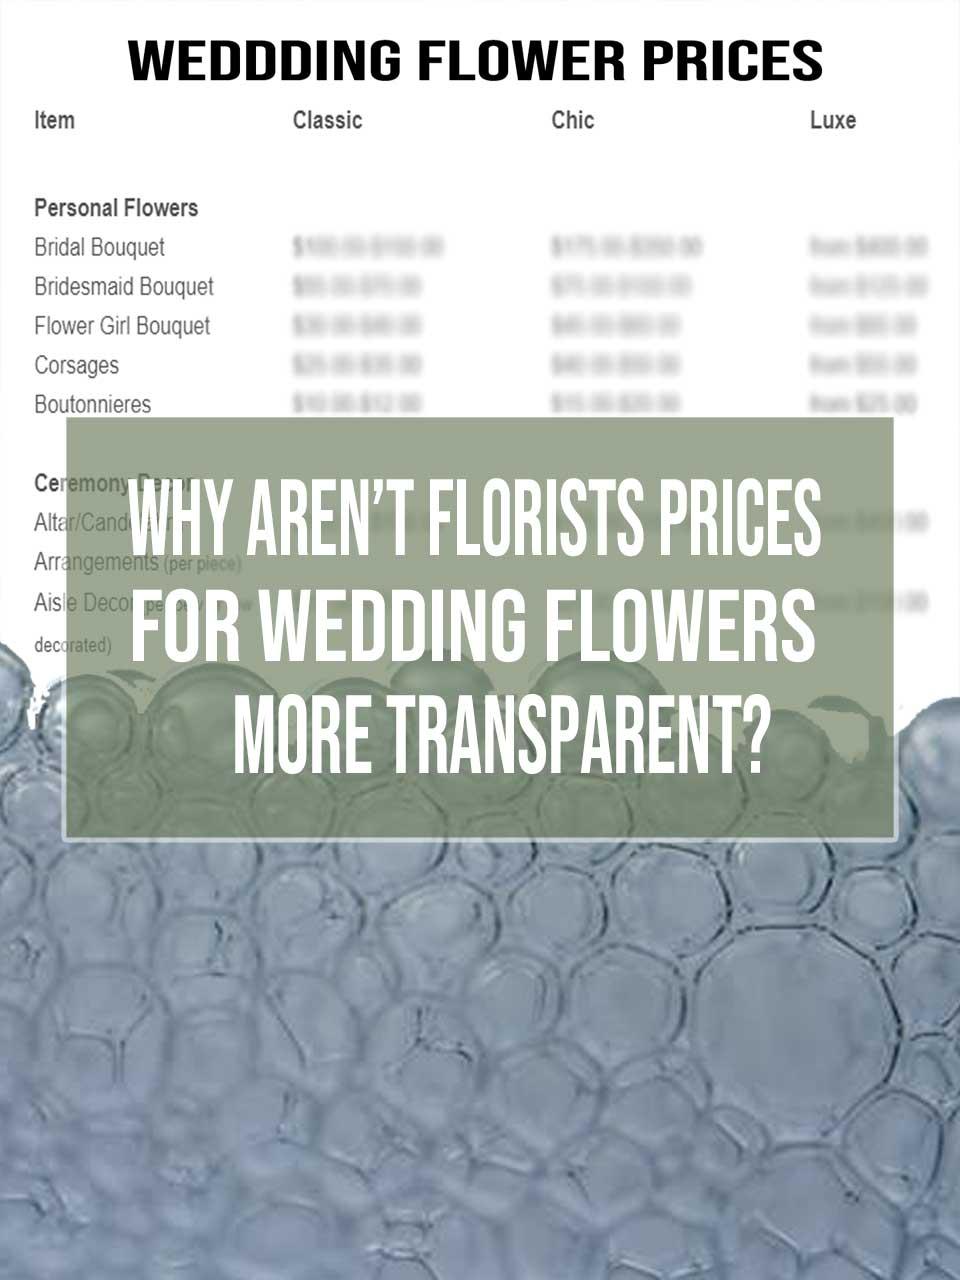 florist prices wedding flowers